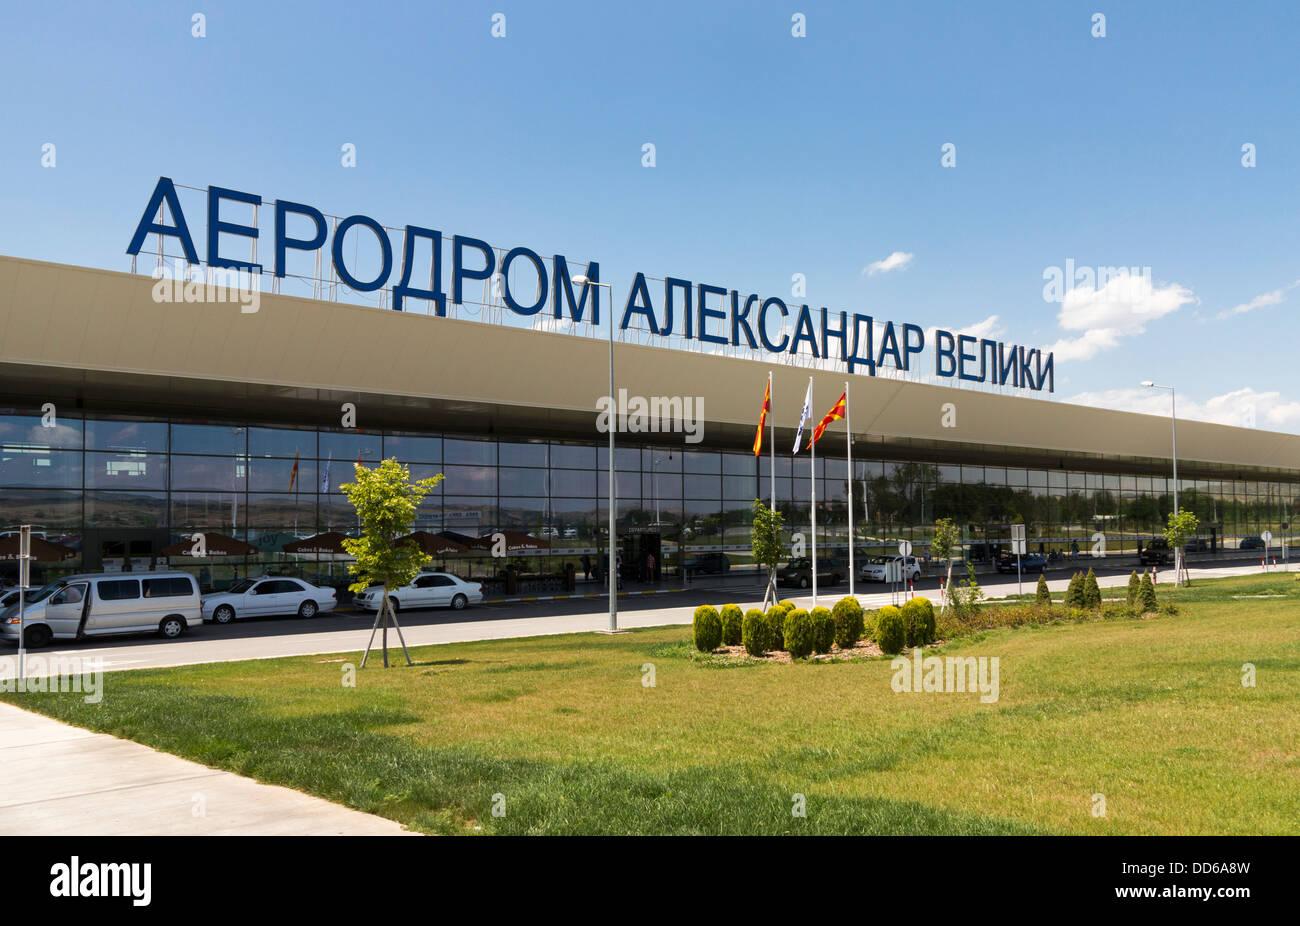 'Alexander the Great' Airport, Skopje, Macedonia - Stock Image